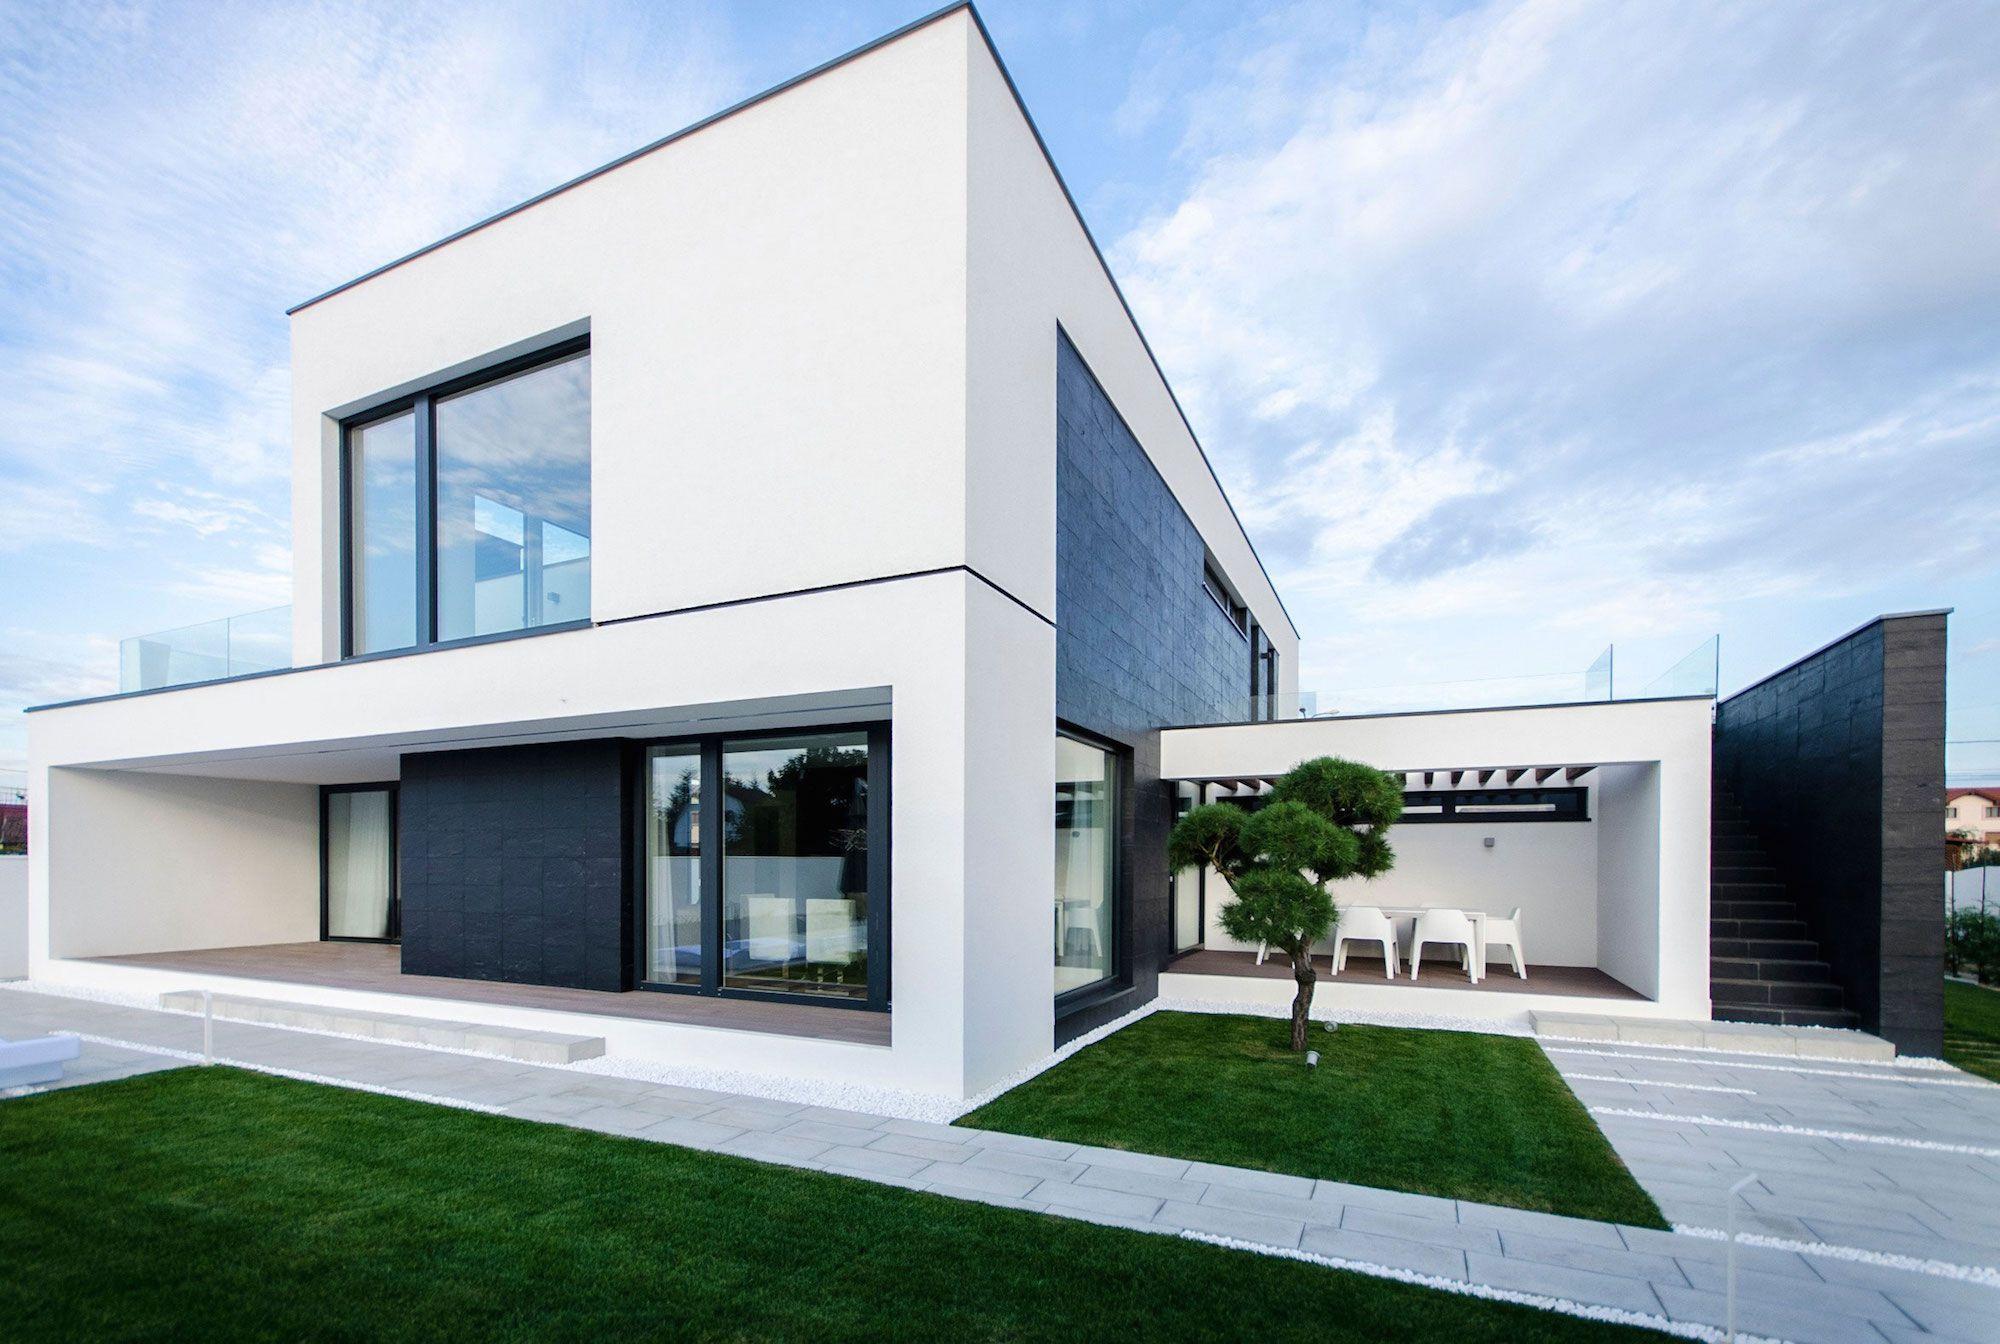 Ultramodern-C-House-in-Timisoara-03